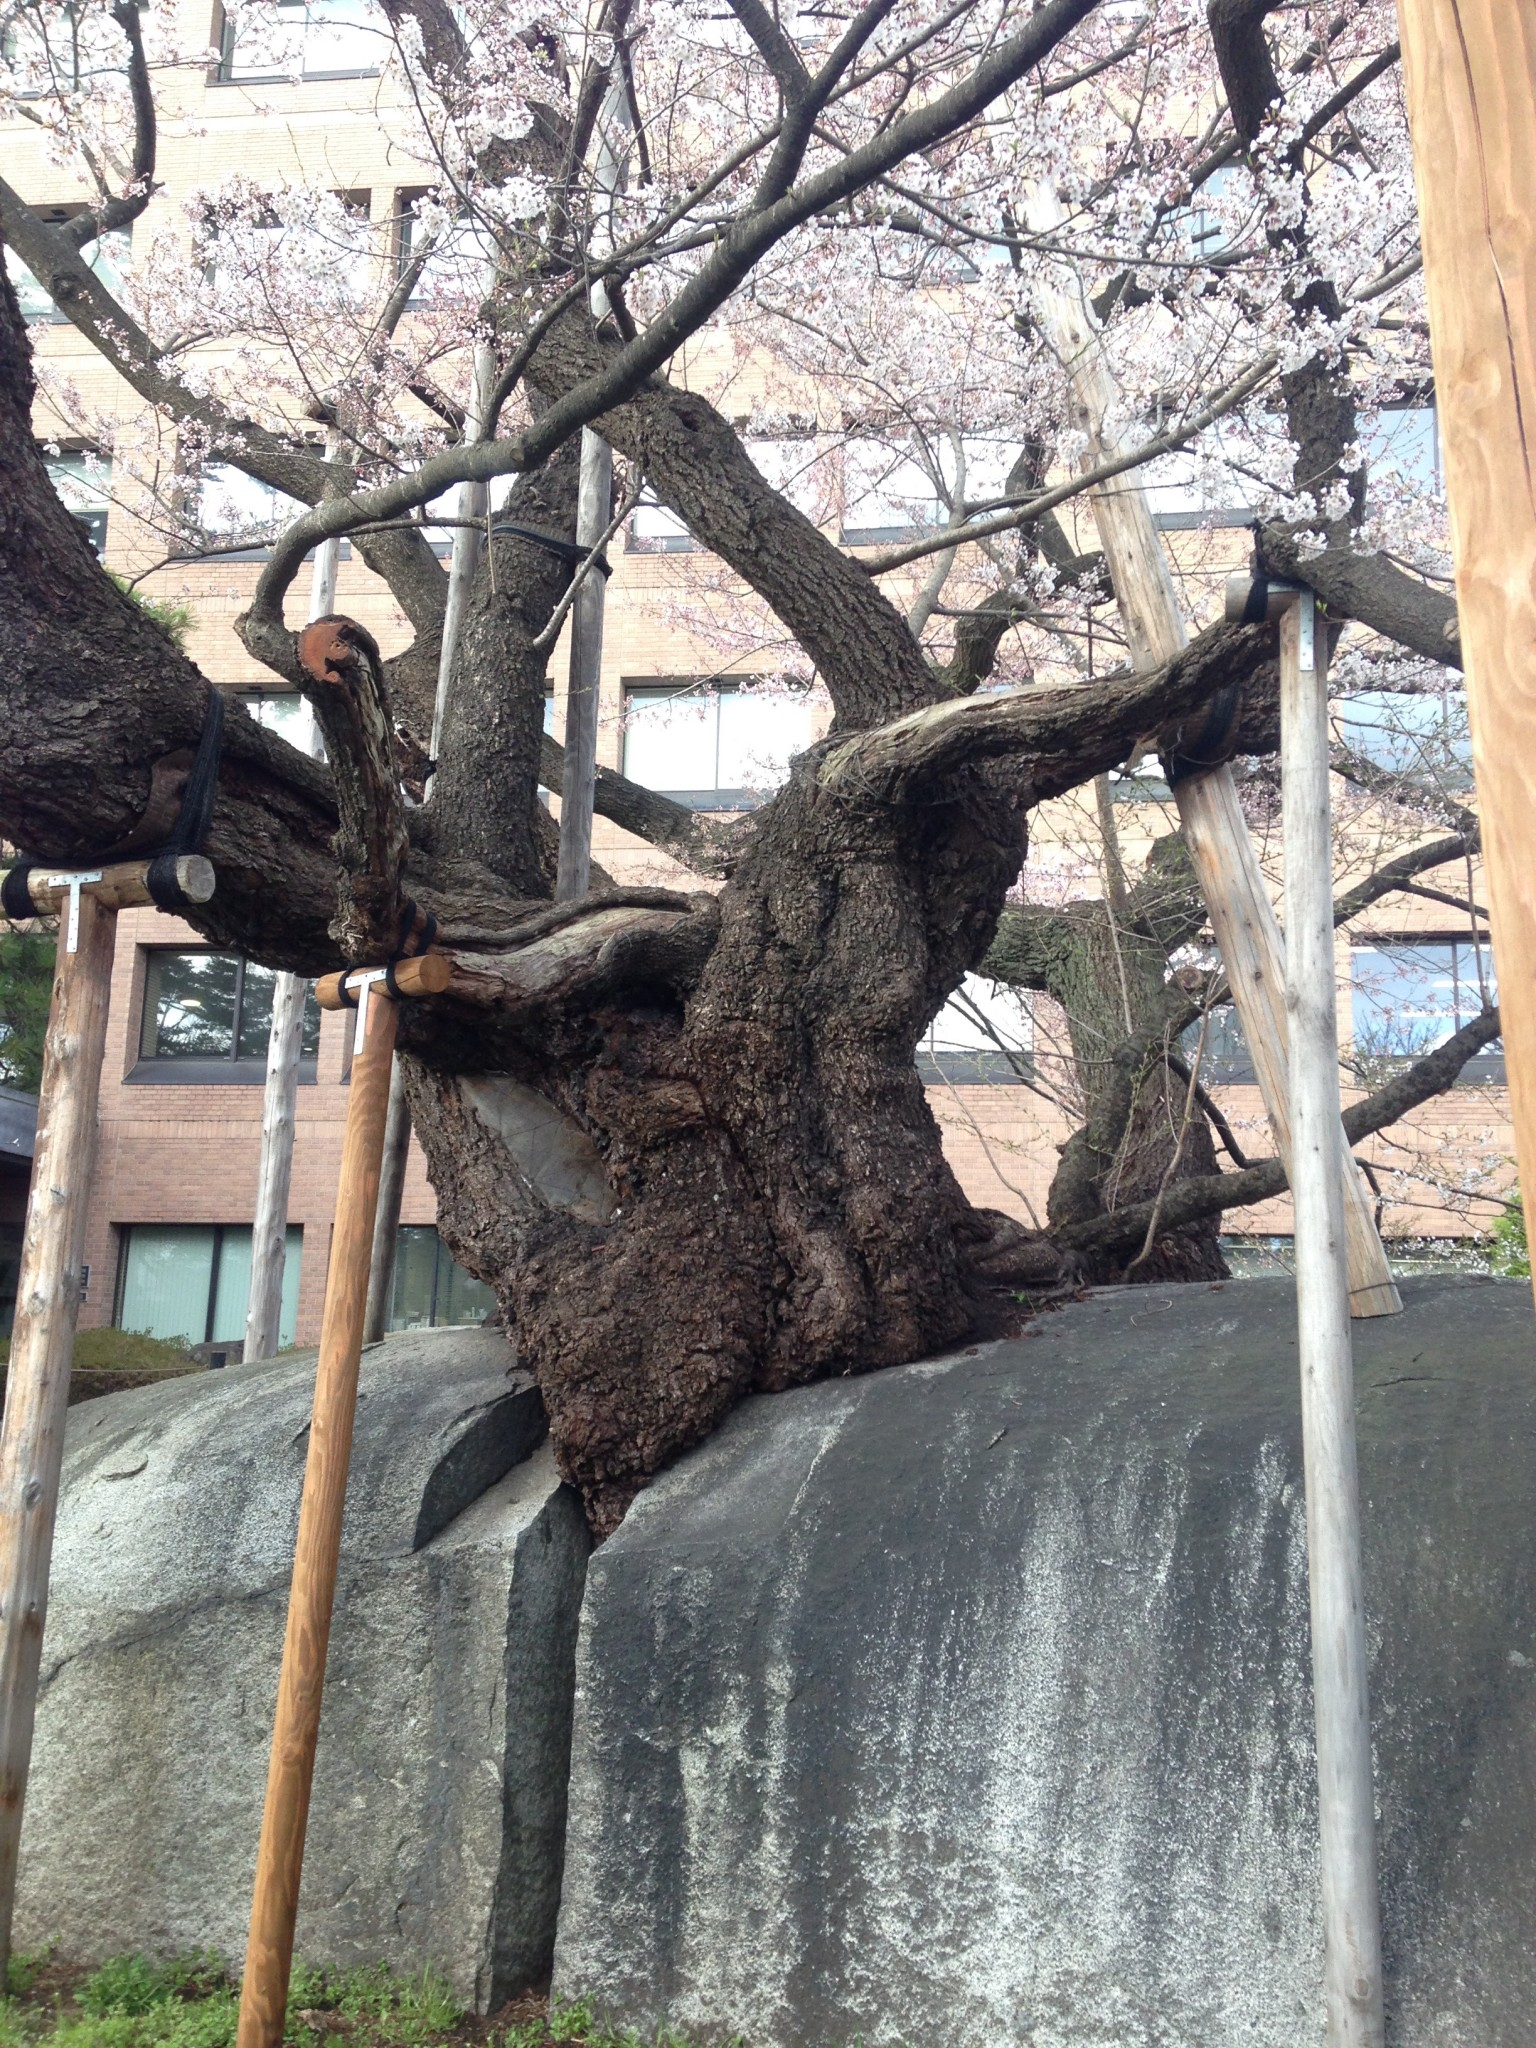 Ishiwari Zakura Visit The Famous Rock Splitting Cherry Tree